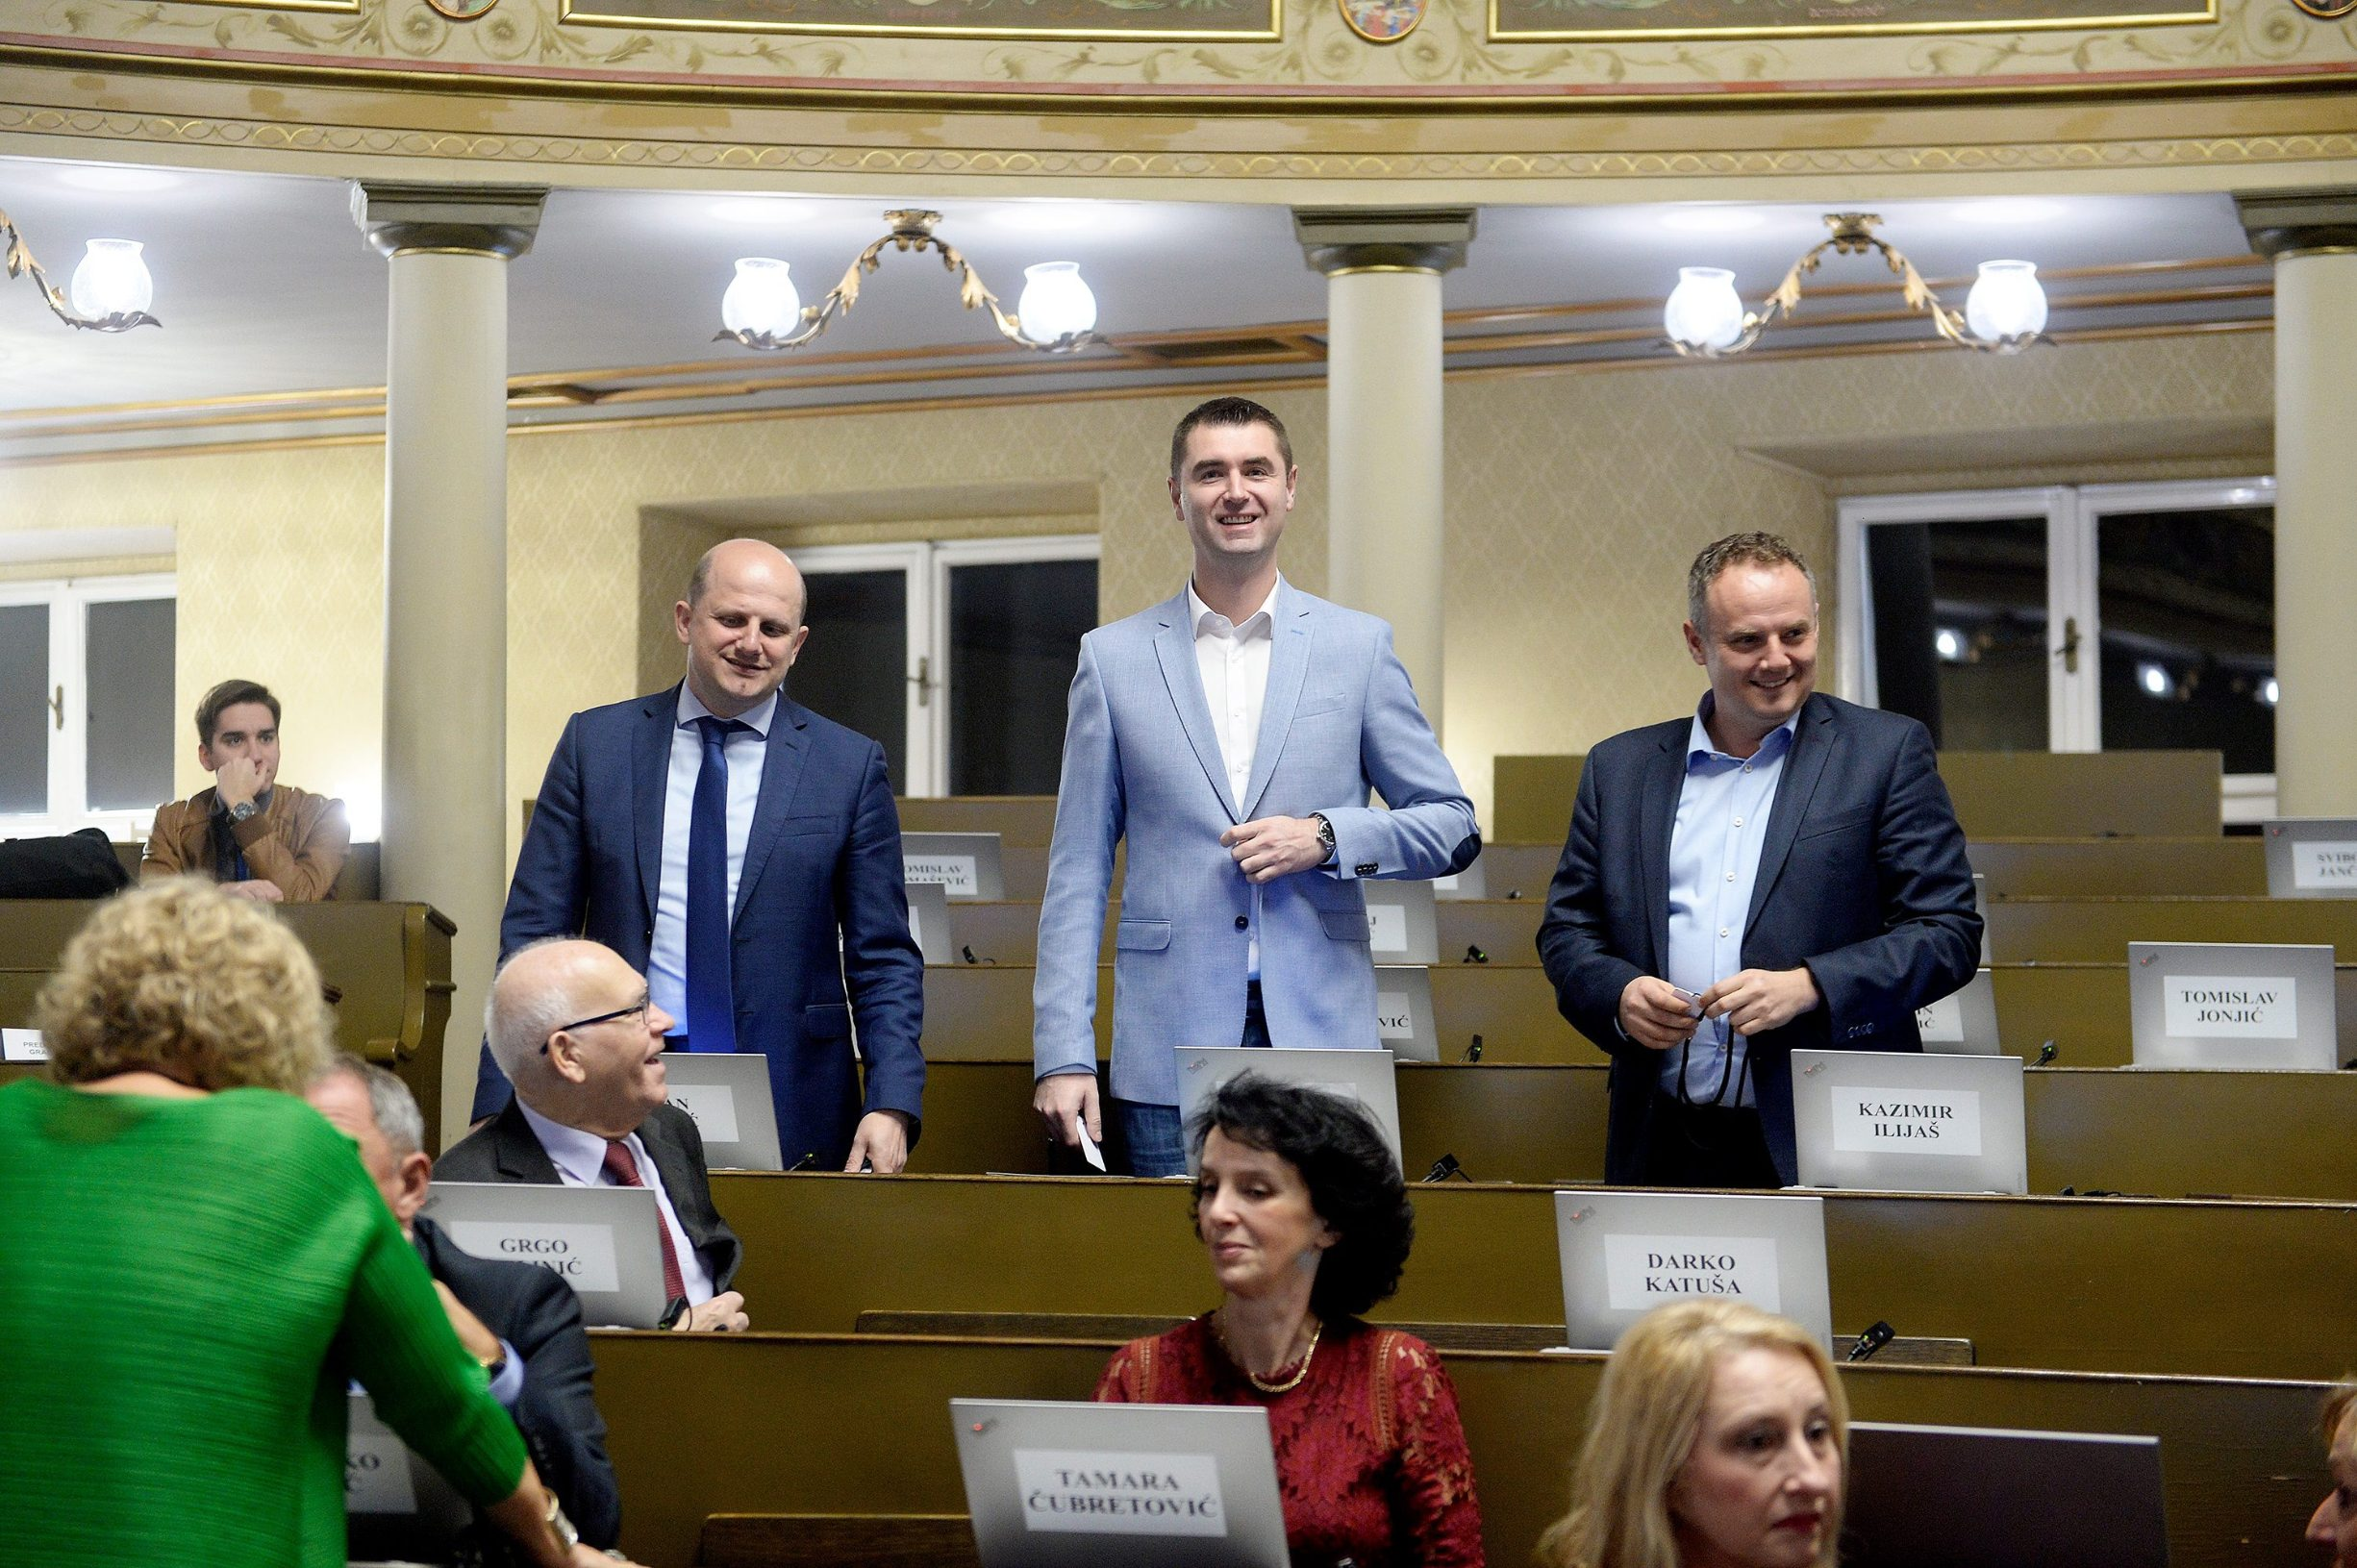 Ivan Ćelić, Davor Filipović, Kazimir Ilijaš